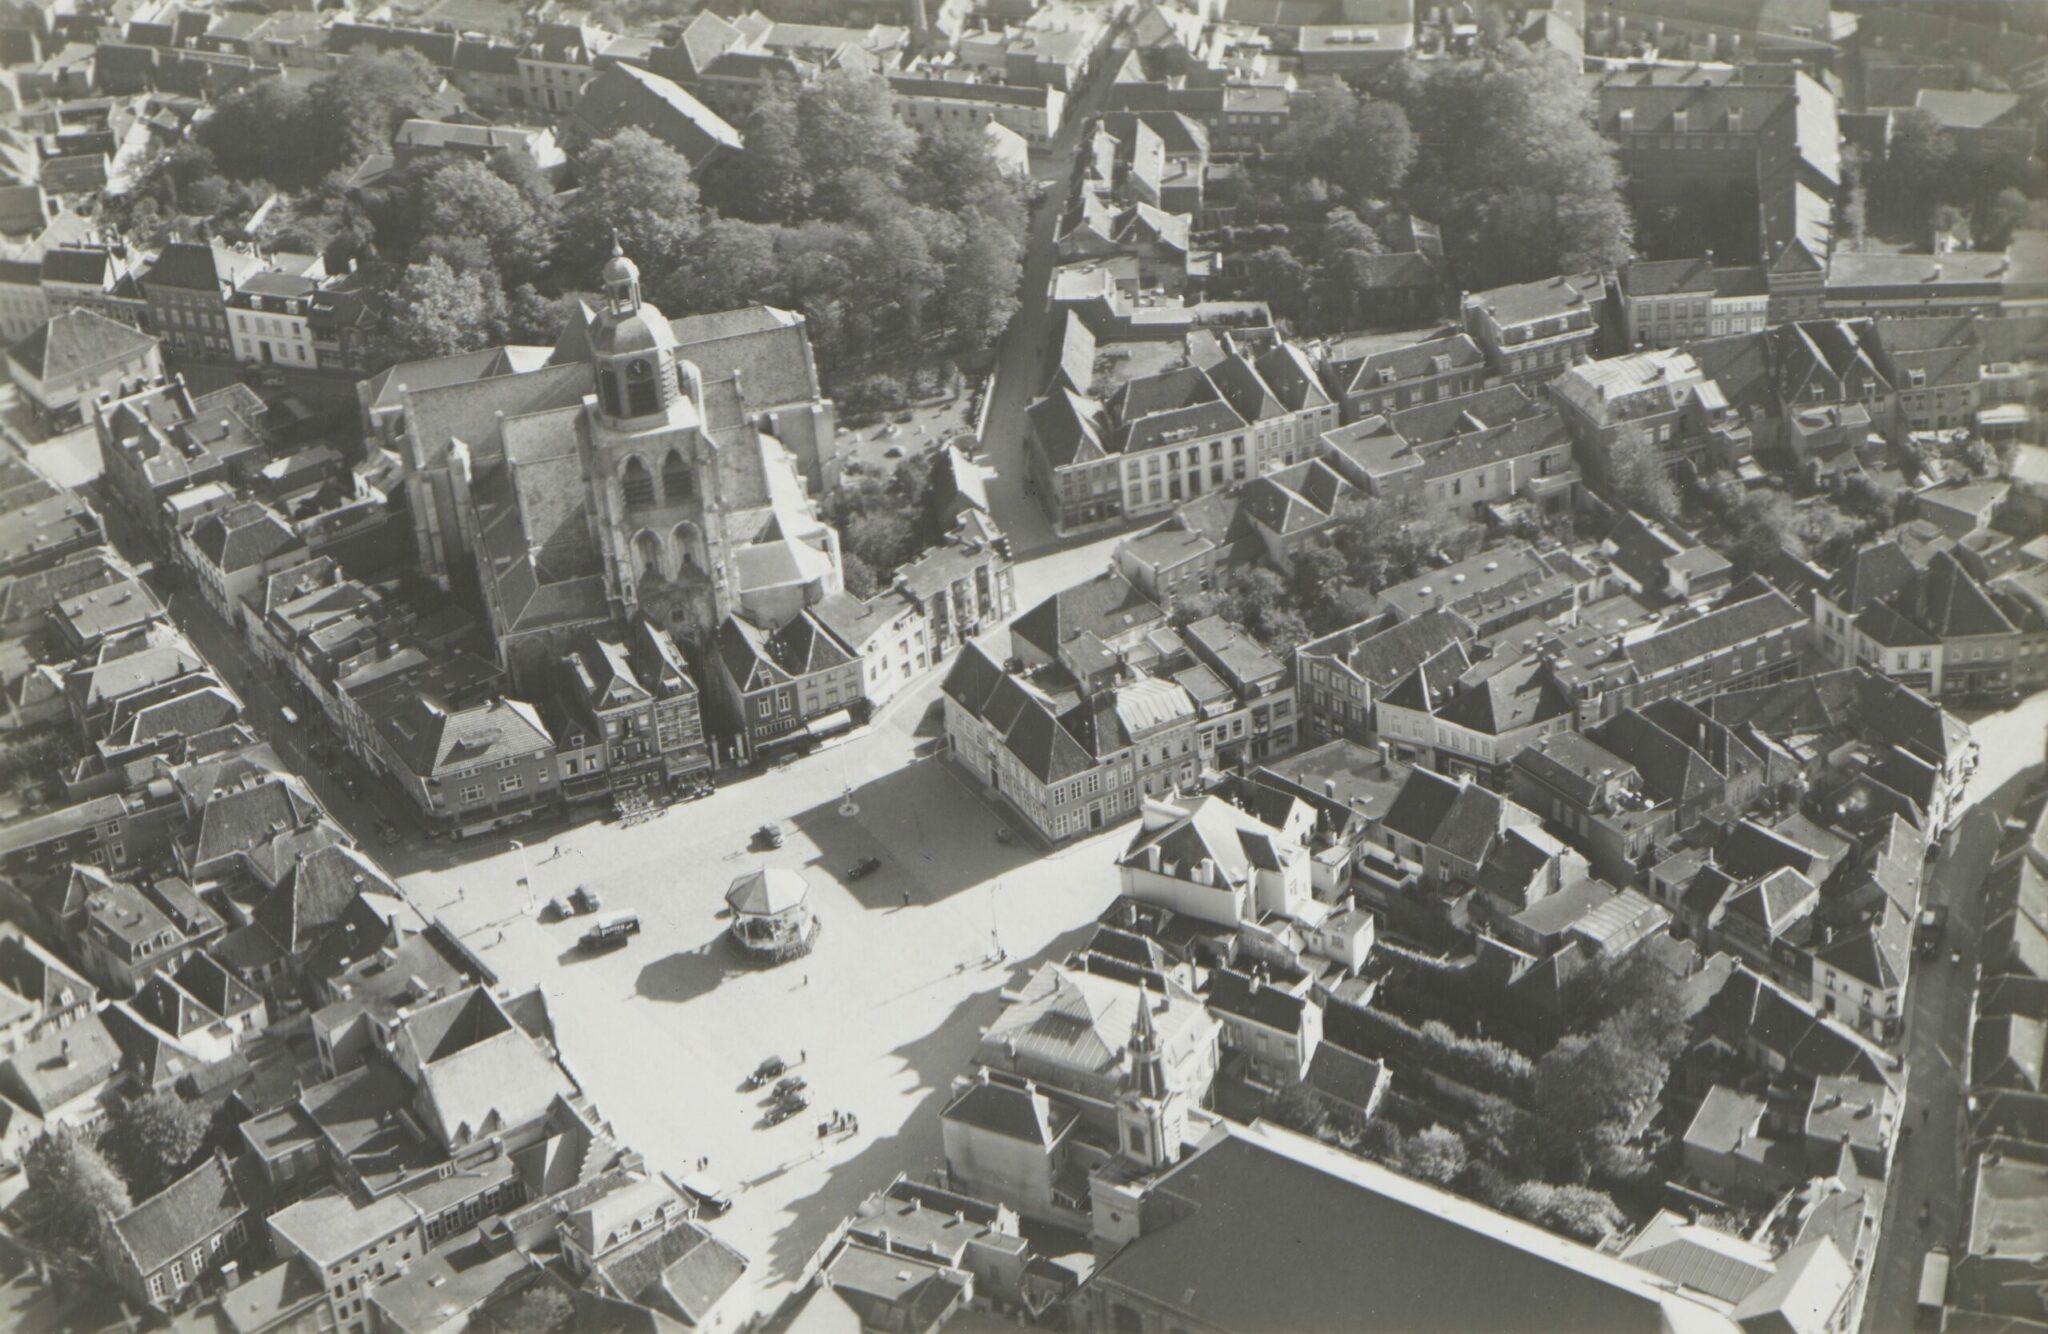 grote markt luchtfoto luchtfoto's peperbus kerk maagd theater kiosk